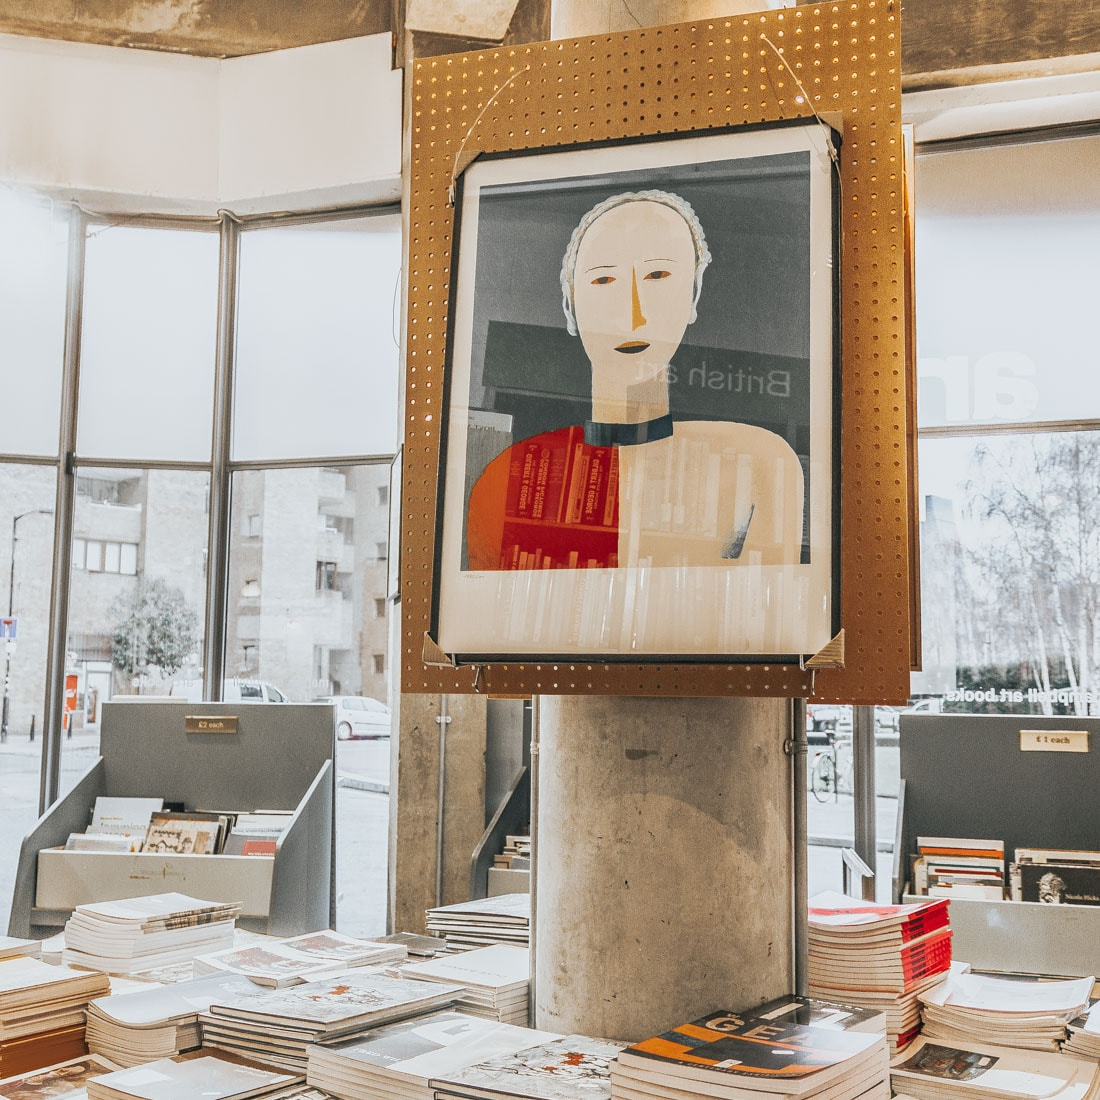 MARCUS CAMPBELL, ART BOOKS, LONDON, BLOG